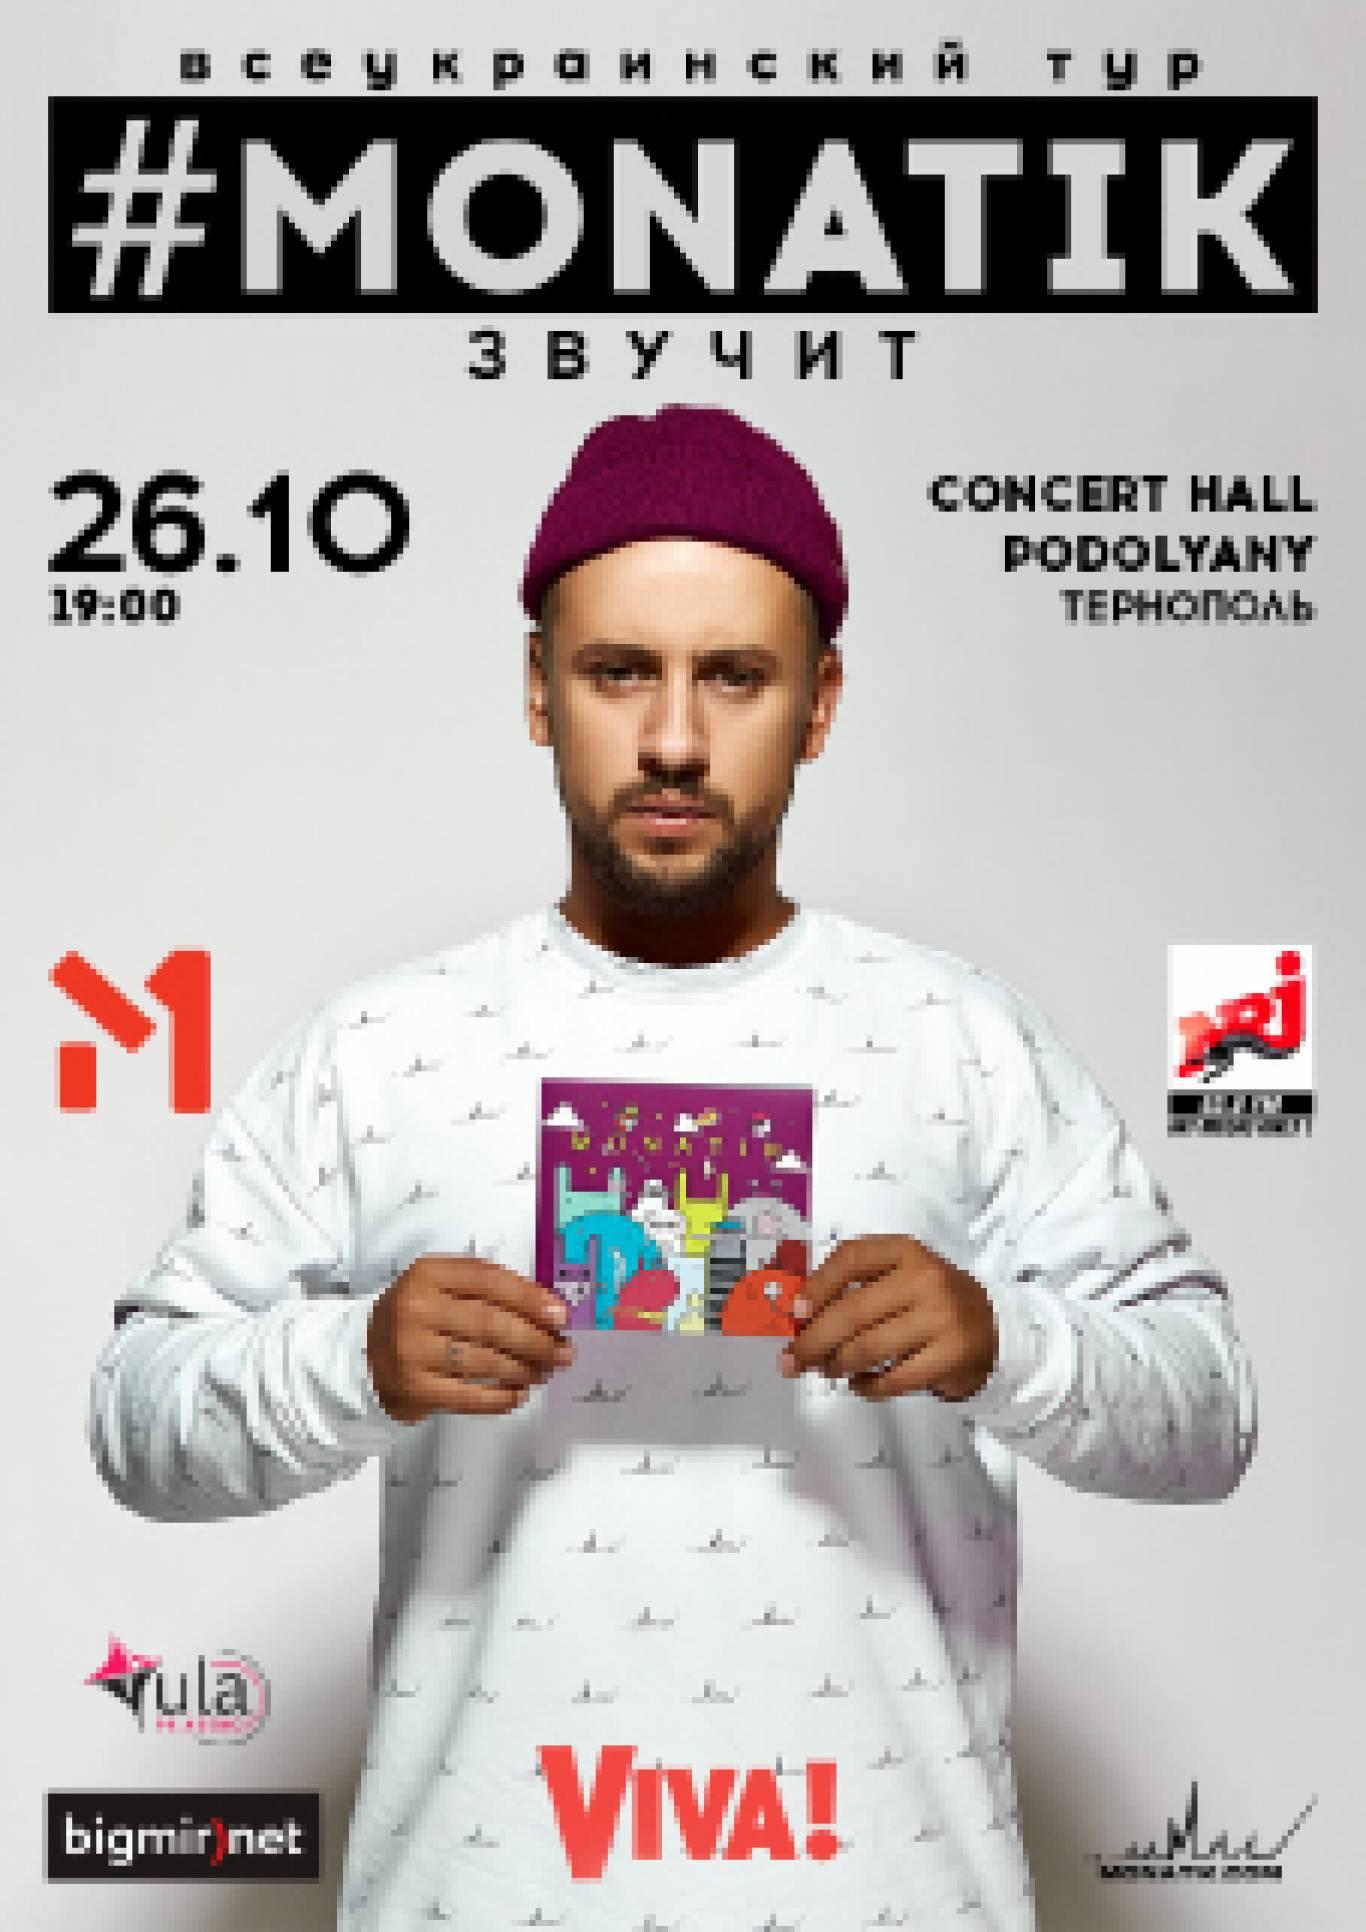 MONATIK вирушає у великий всеукраїнський тур